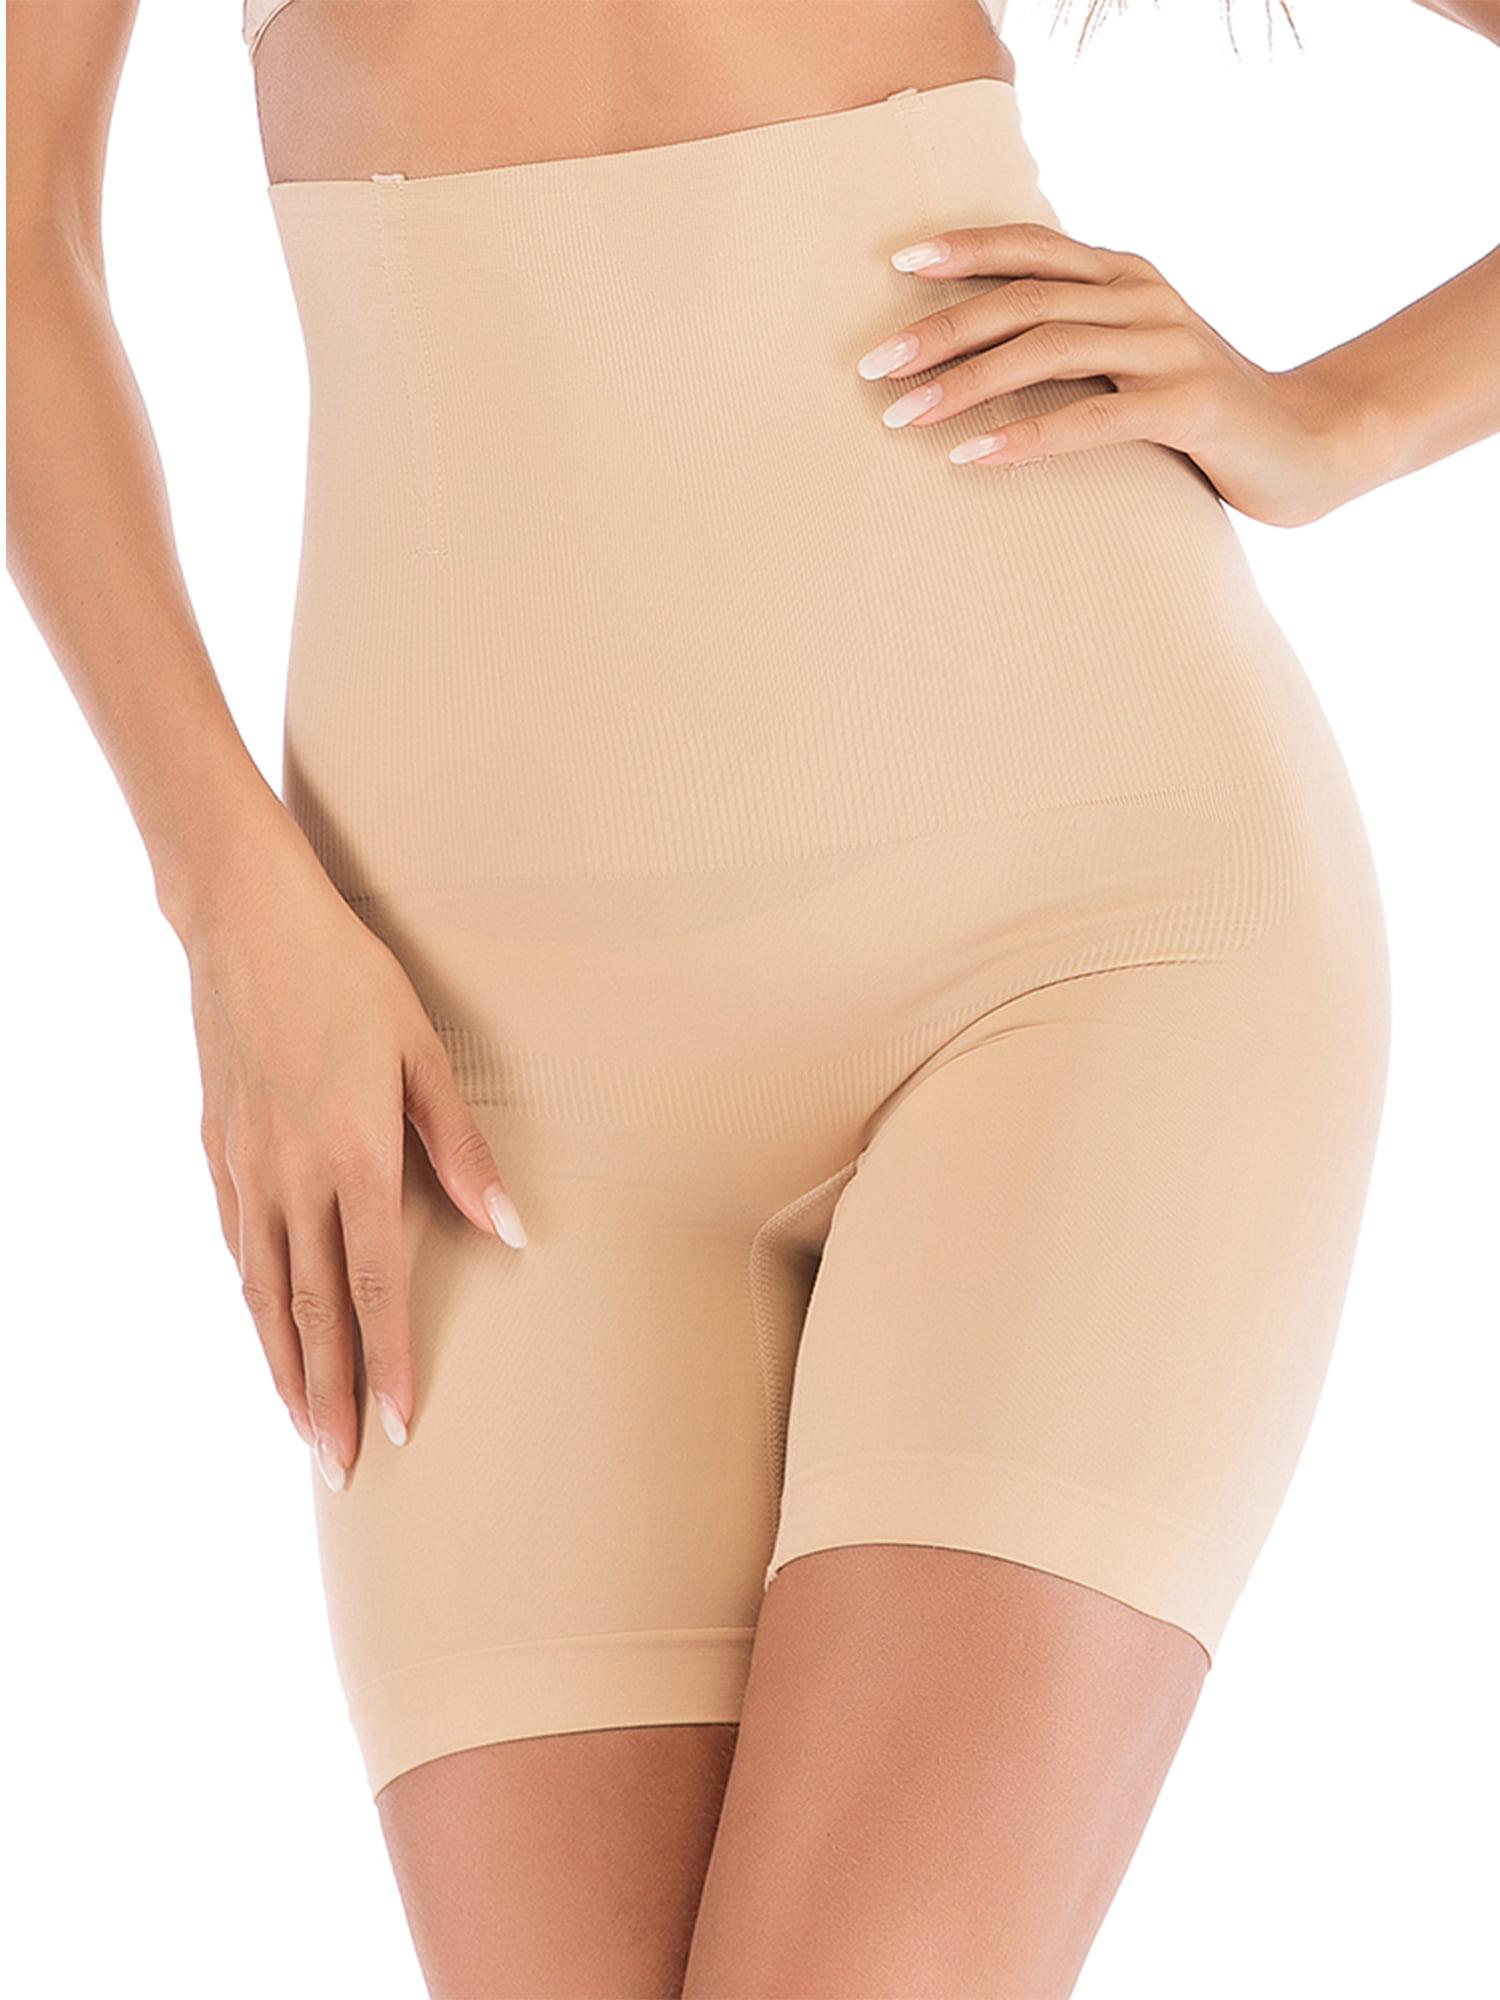 489027be0 SAYFUT - Women s High Waist Ultra Firm Control Tummy Body Shaper Panty  Seamless Smooth Thigh Slimmer Body Shorts Shaping Brief Shapewear -  Walmart.com